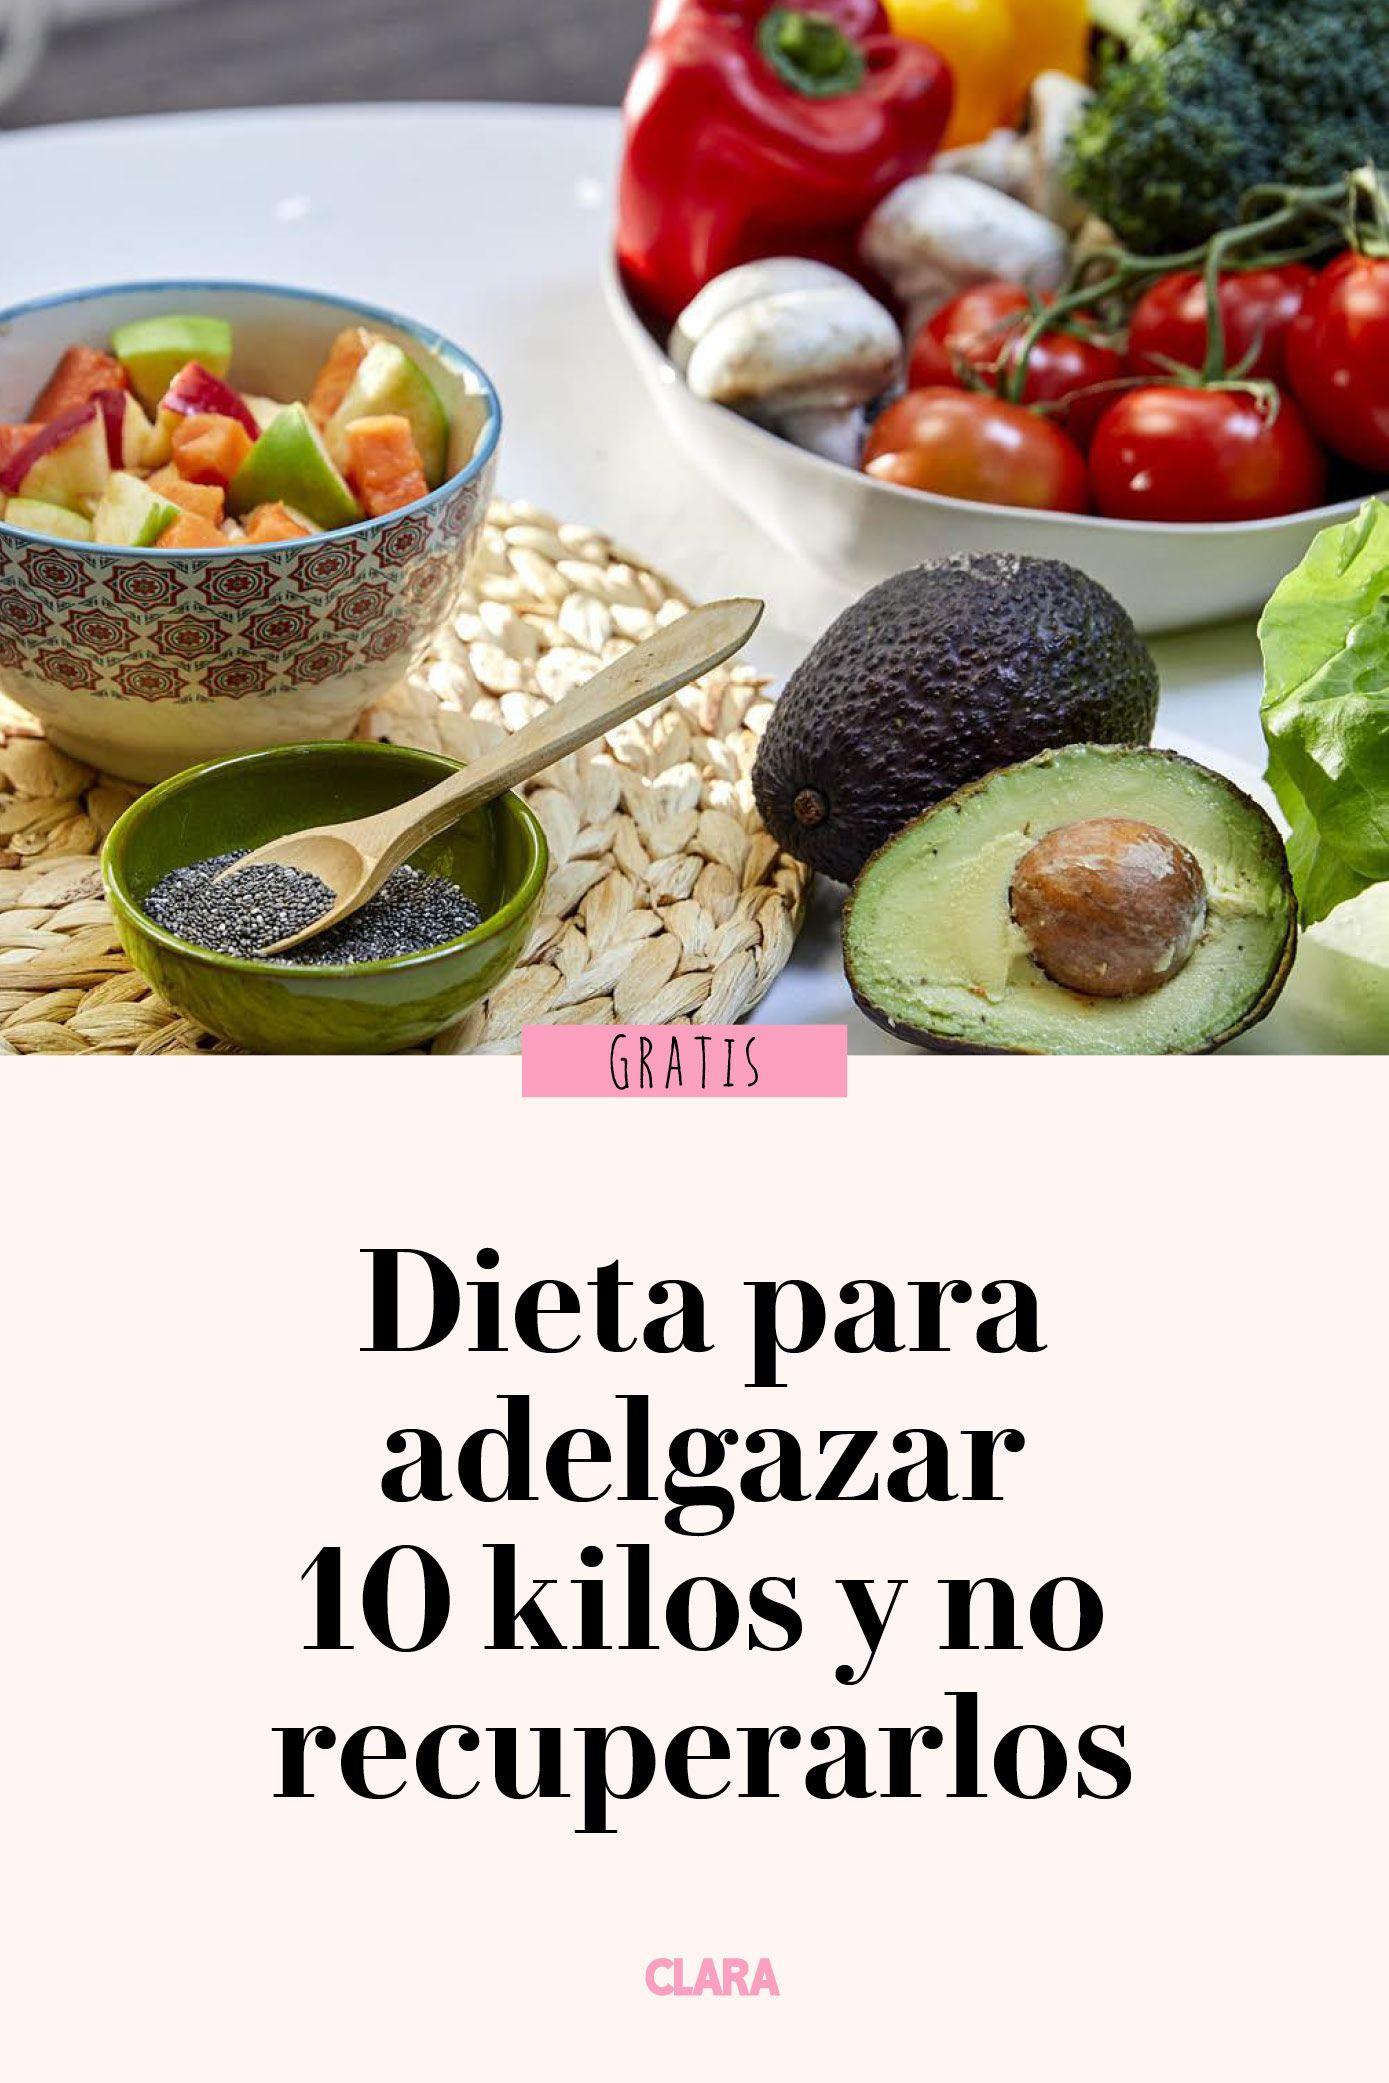 Dieta Para Adelgazar 10 Kilos Comida De Dieta Bajar De Peso Alimentacion Saludable Bajar De Peso Comida Saludable Bajar De Peso Recetas